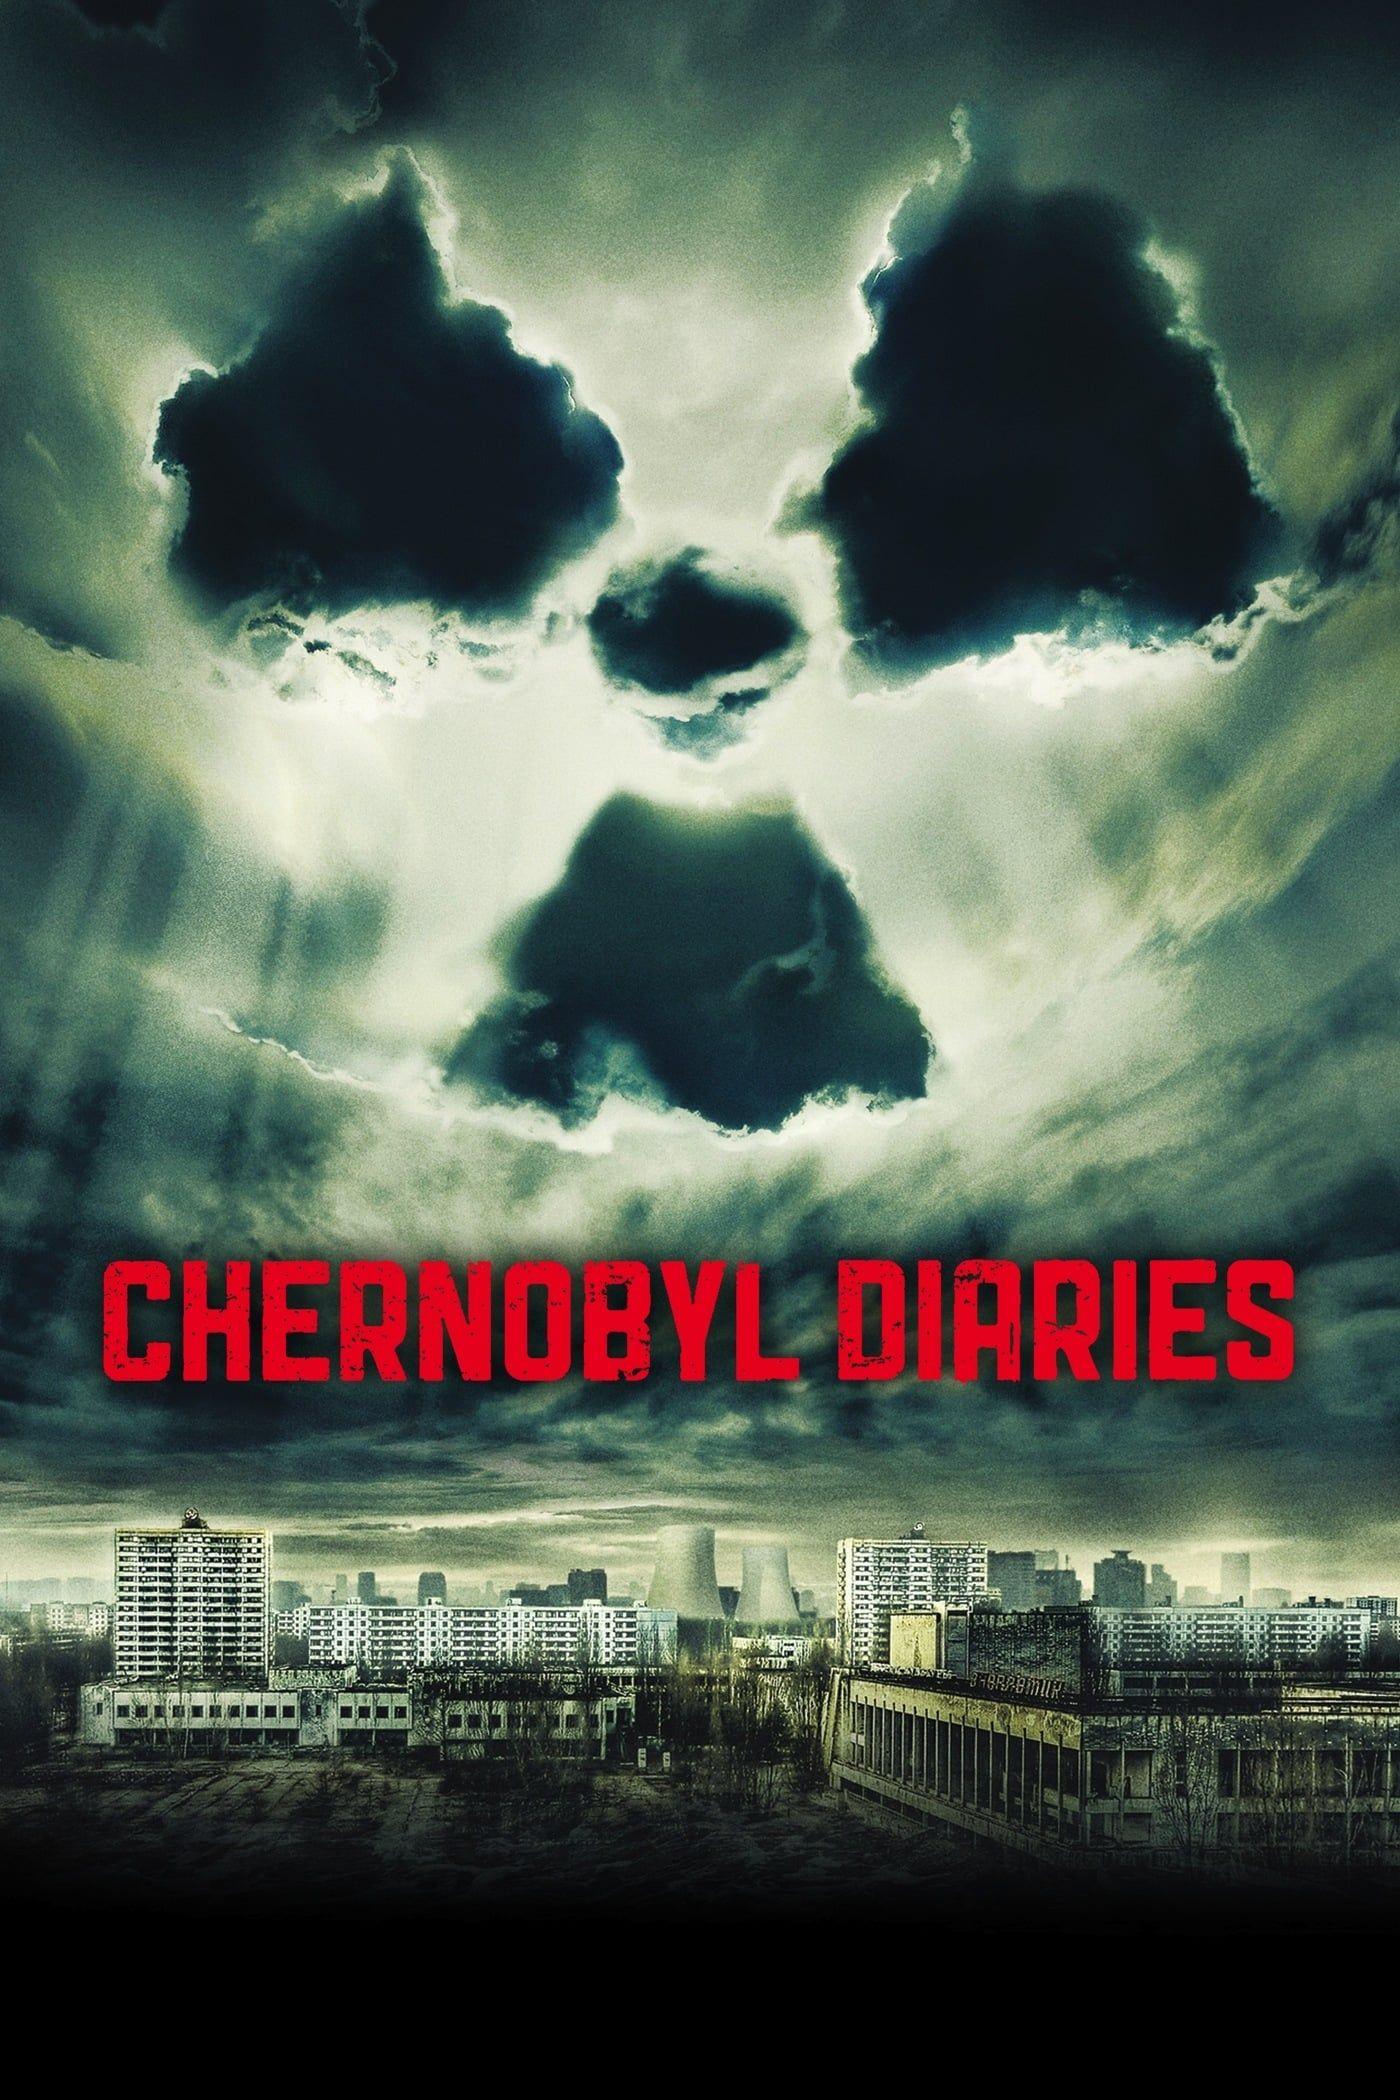 Chernobyl Streaming Vf Hd : chernobyl, streaming, HD-1080p].Chernobyl, Diaries, Pelicula*Completa, Español, Latino, Videos, Líñea, Españo, #ChernobylDiaries, #mo…, Chernobyl,, Movies, Online,, Streaming